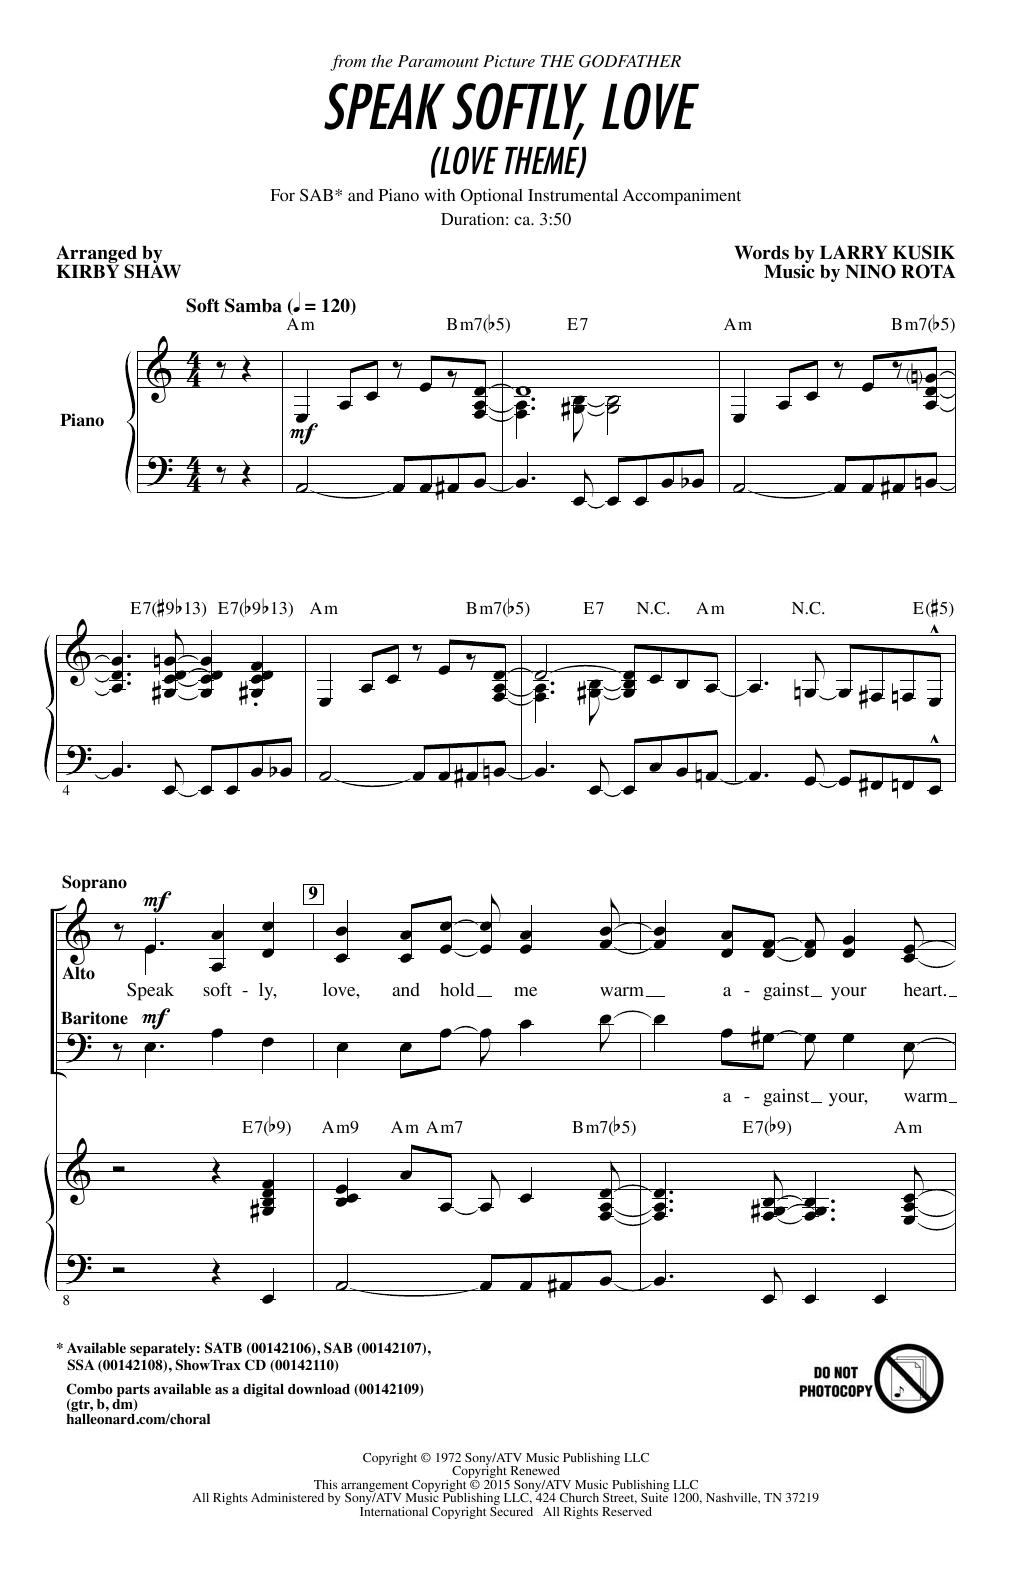 Speak Softly Love (Godfather Theme) (arr. Kirby Shaw) Sheet Music